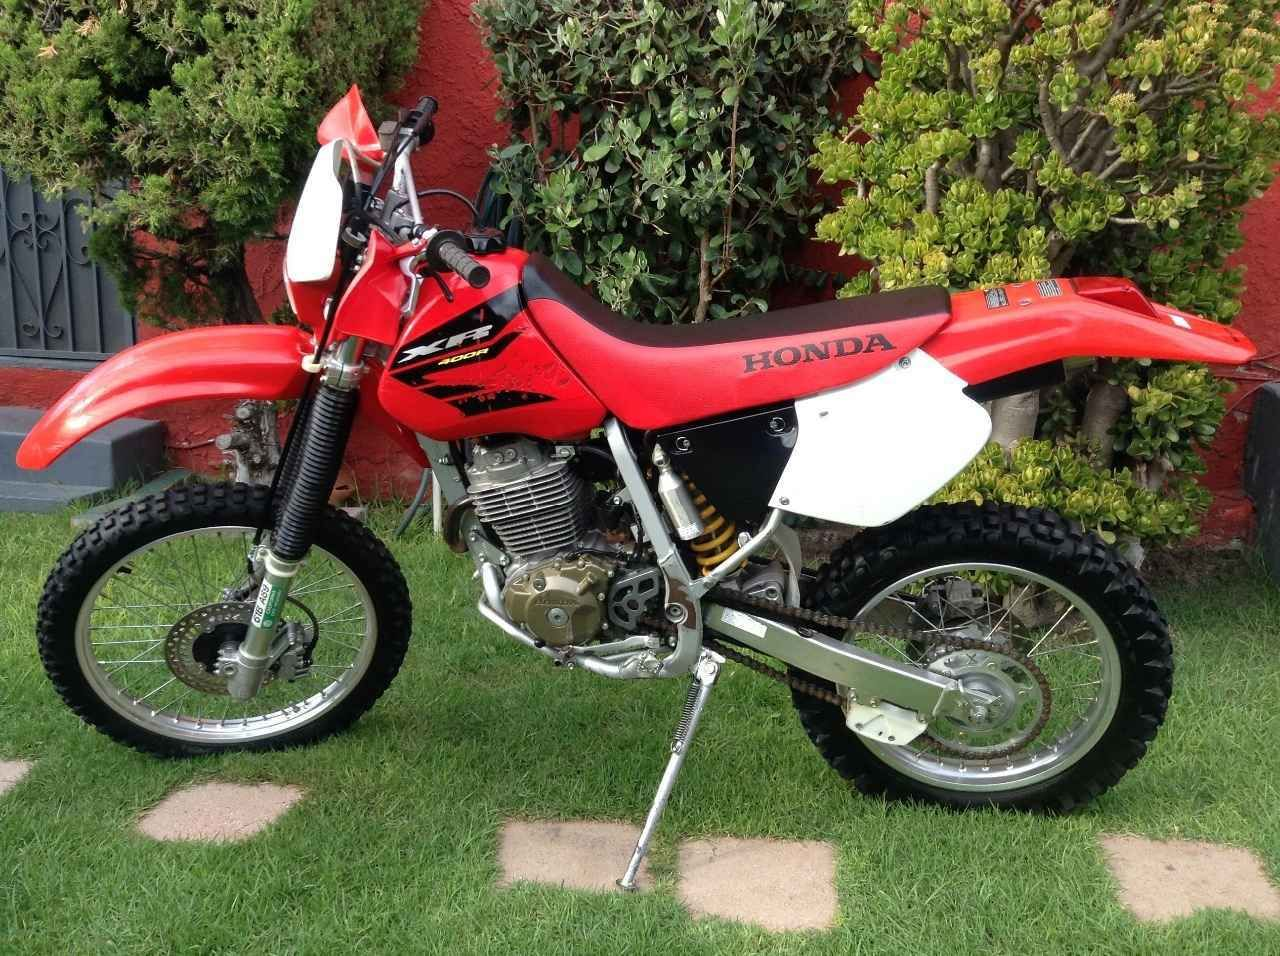 2004 Honda XR 400 Motorcycles for sale, Honda shadow